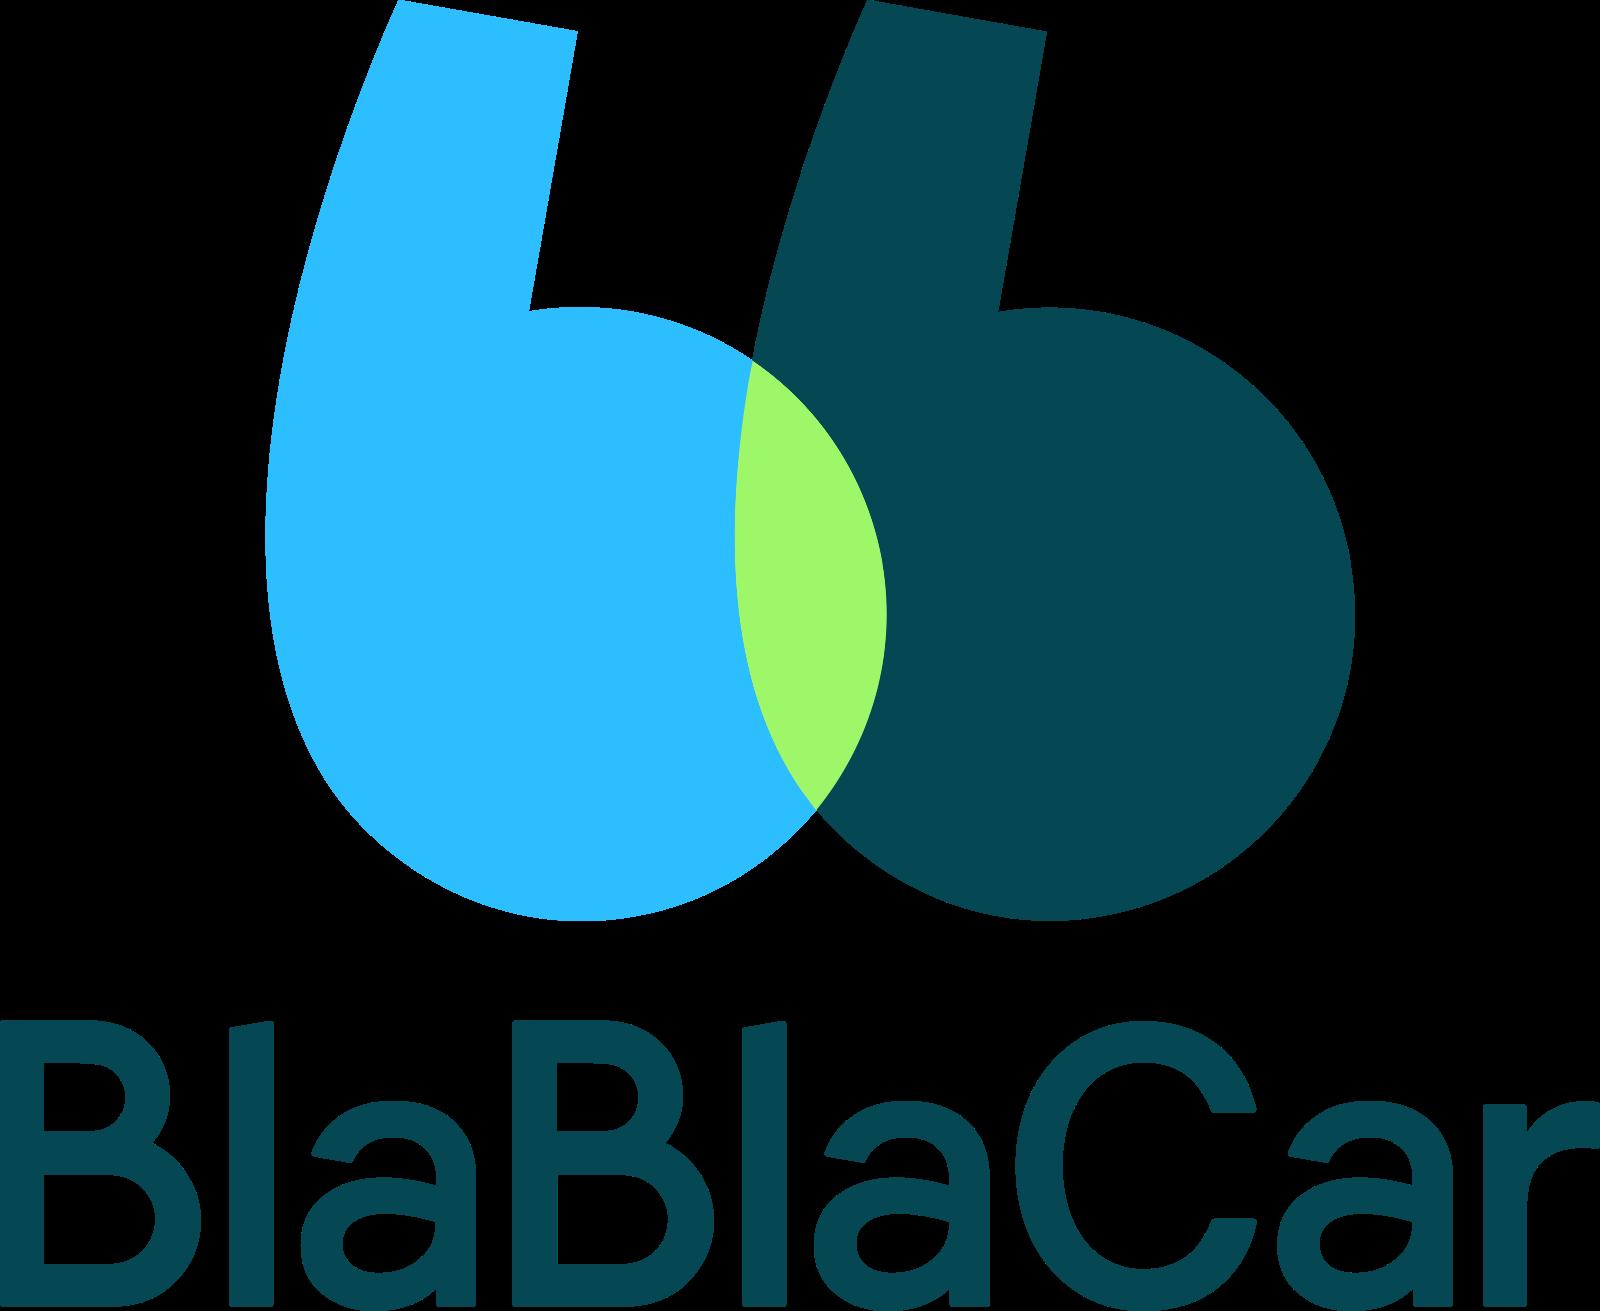 blablacar-logo-5